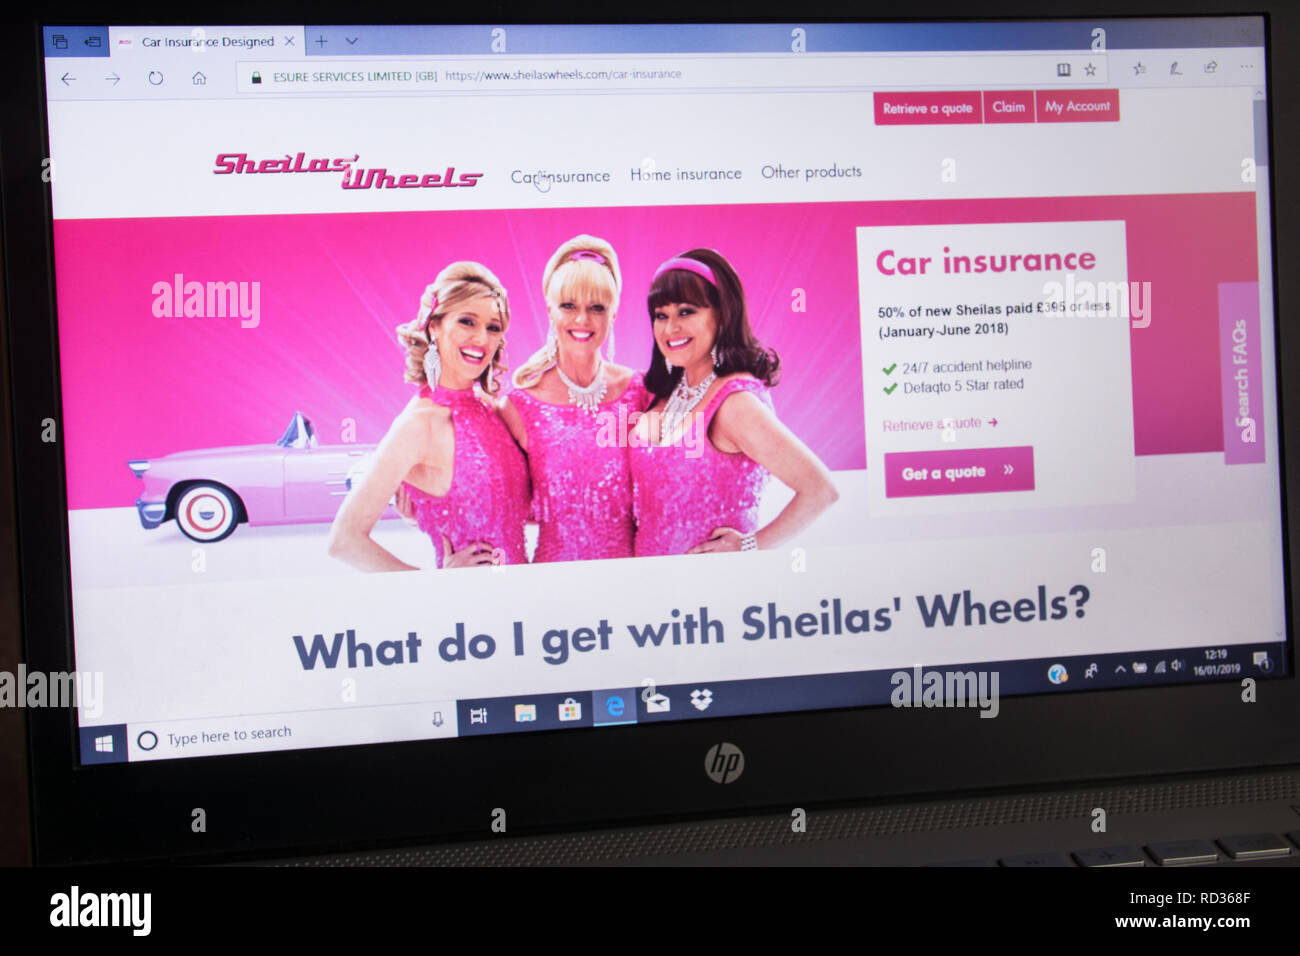 Sheila's Wheels insurance company advert on laptop computer - screenshot of website - Stock Image